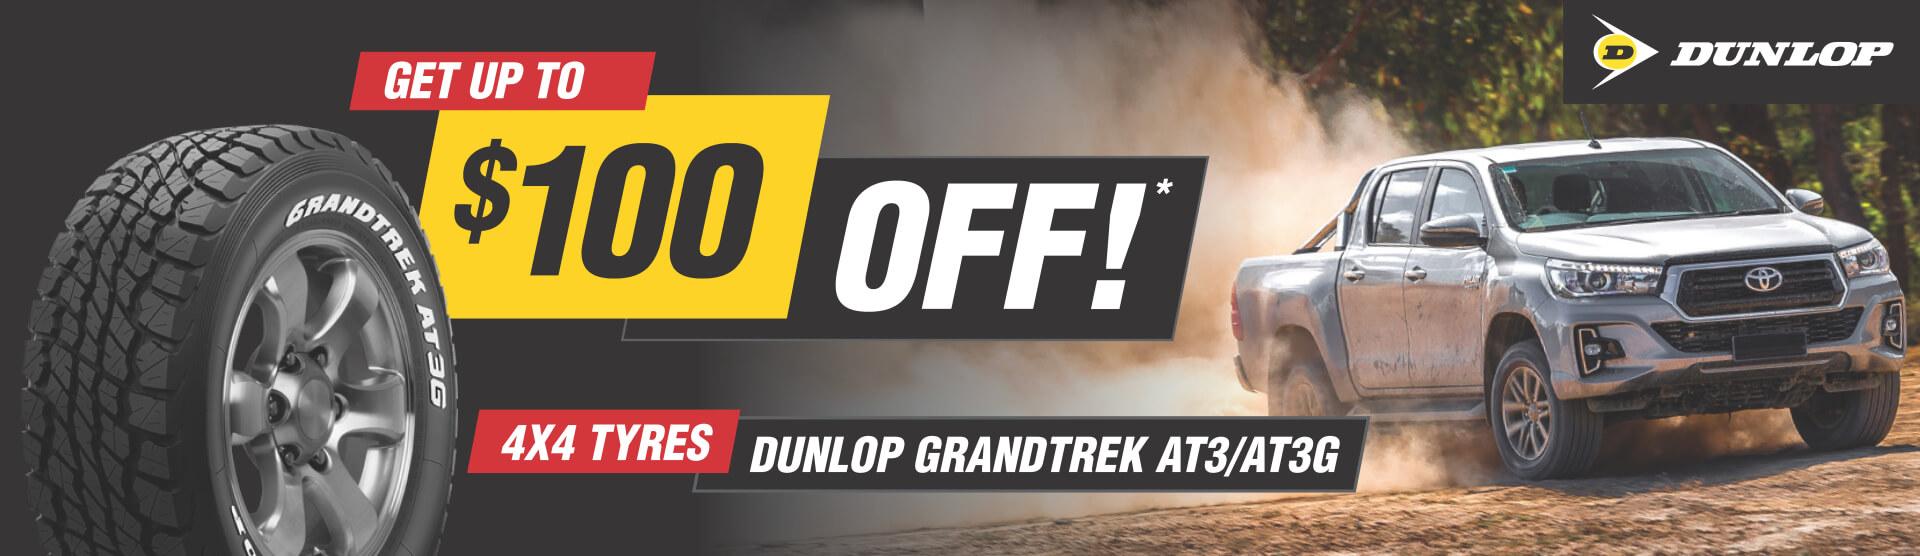 Dunlop Grandtrek AT3 Special